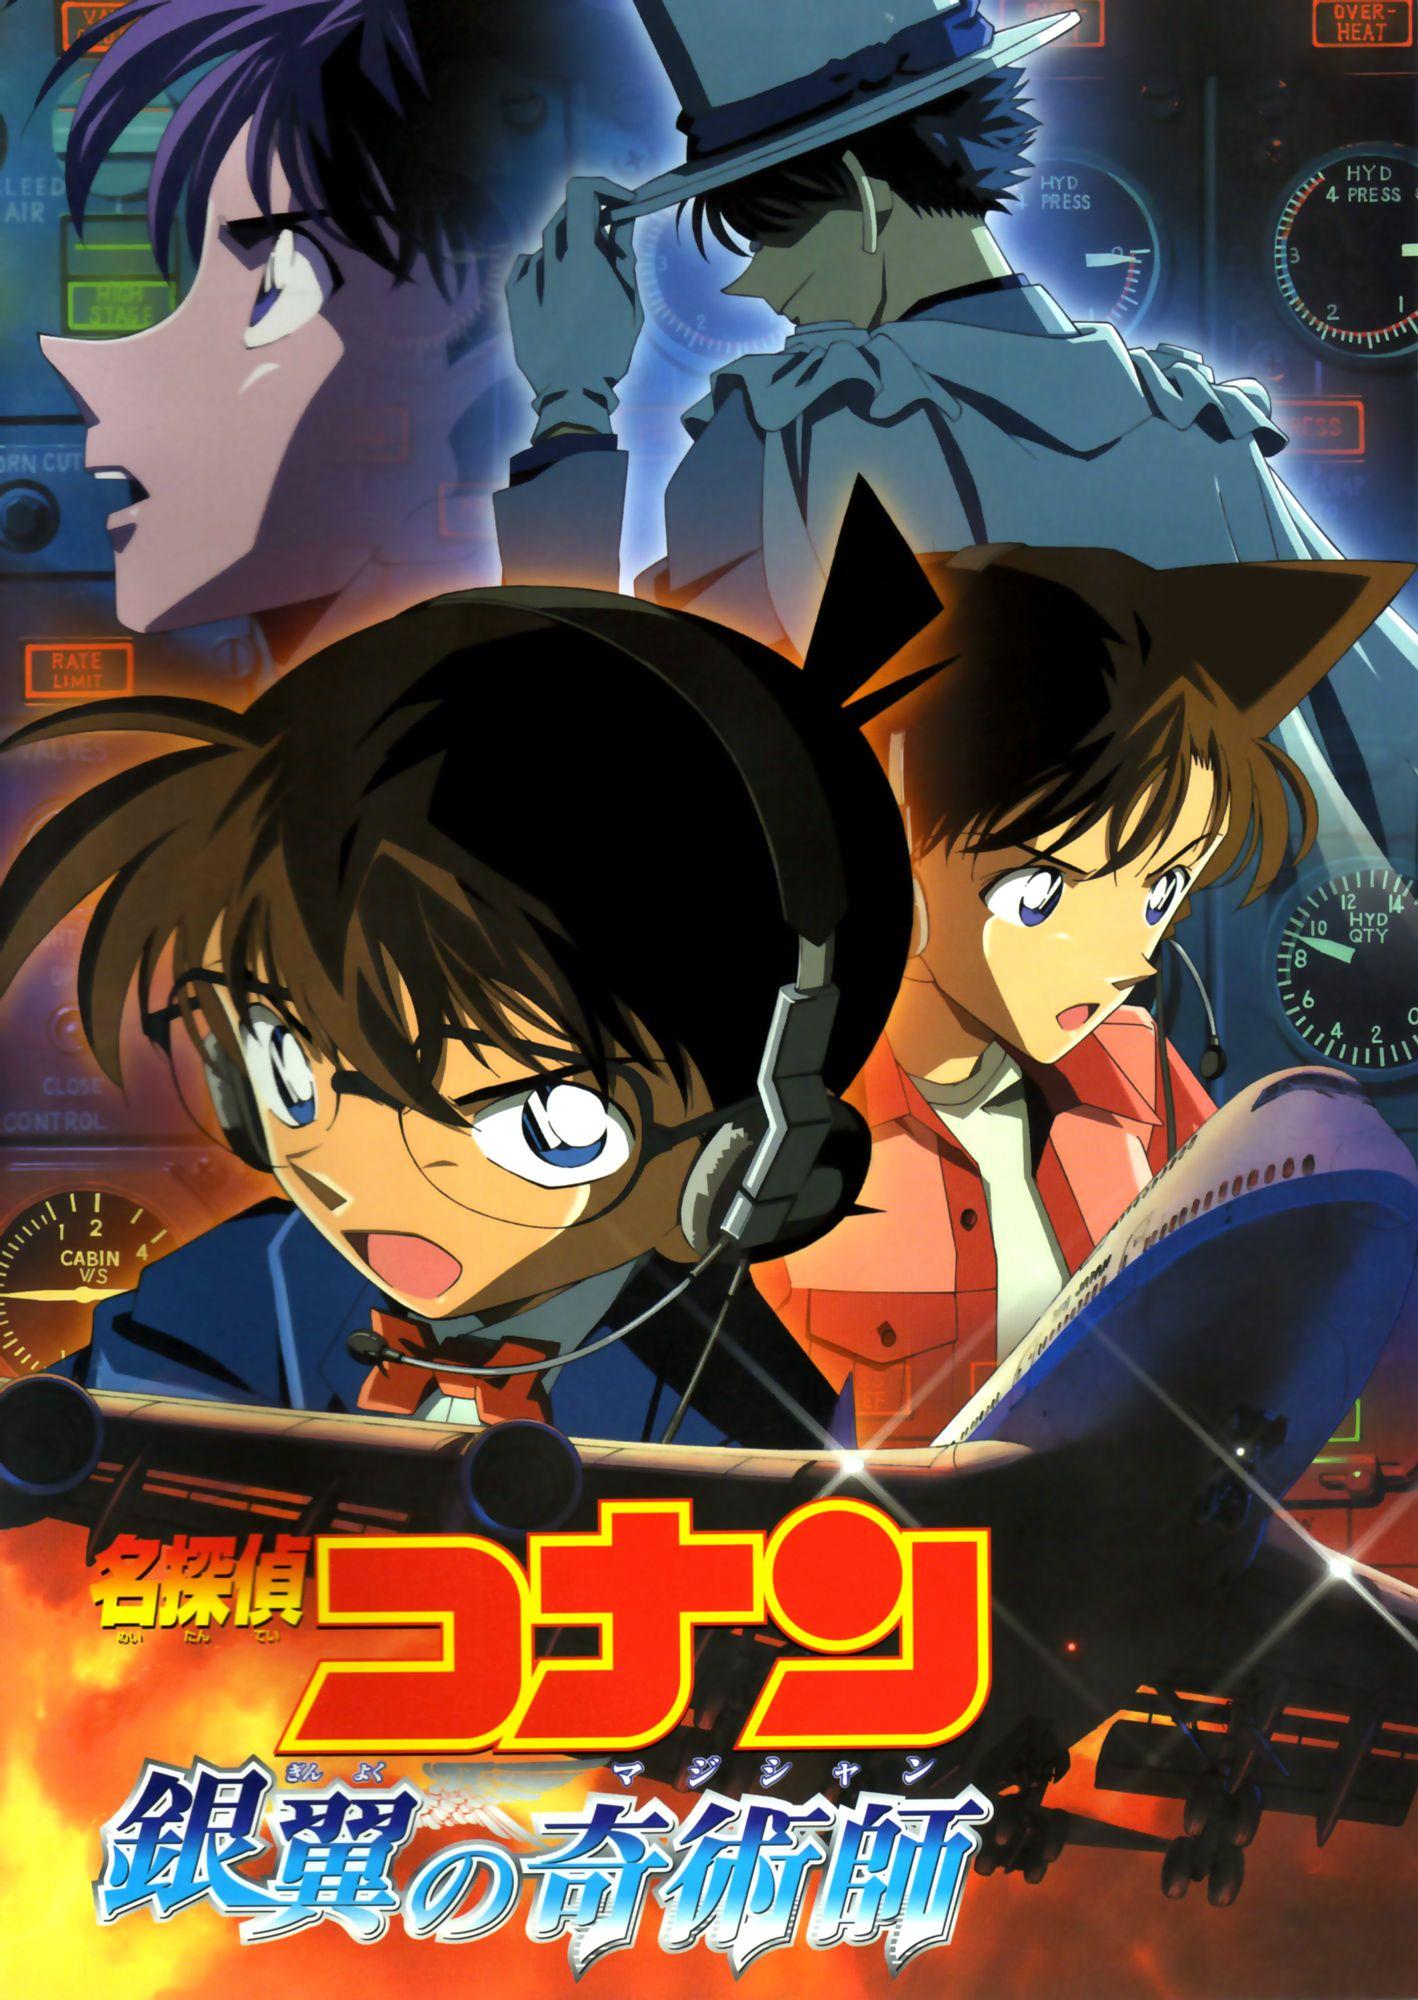 conan movie 8 poster (1418x2000) 刑事, 名探偵コナン